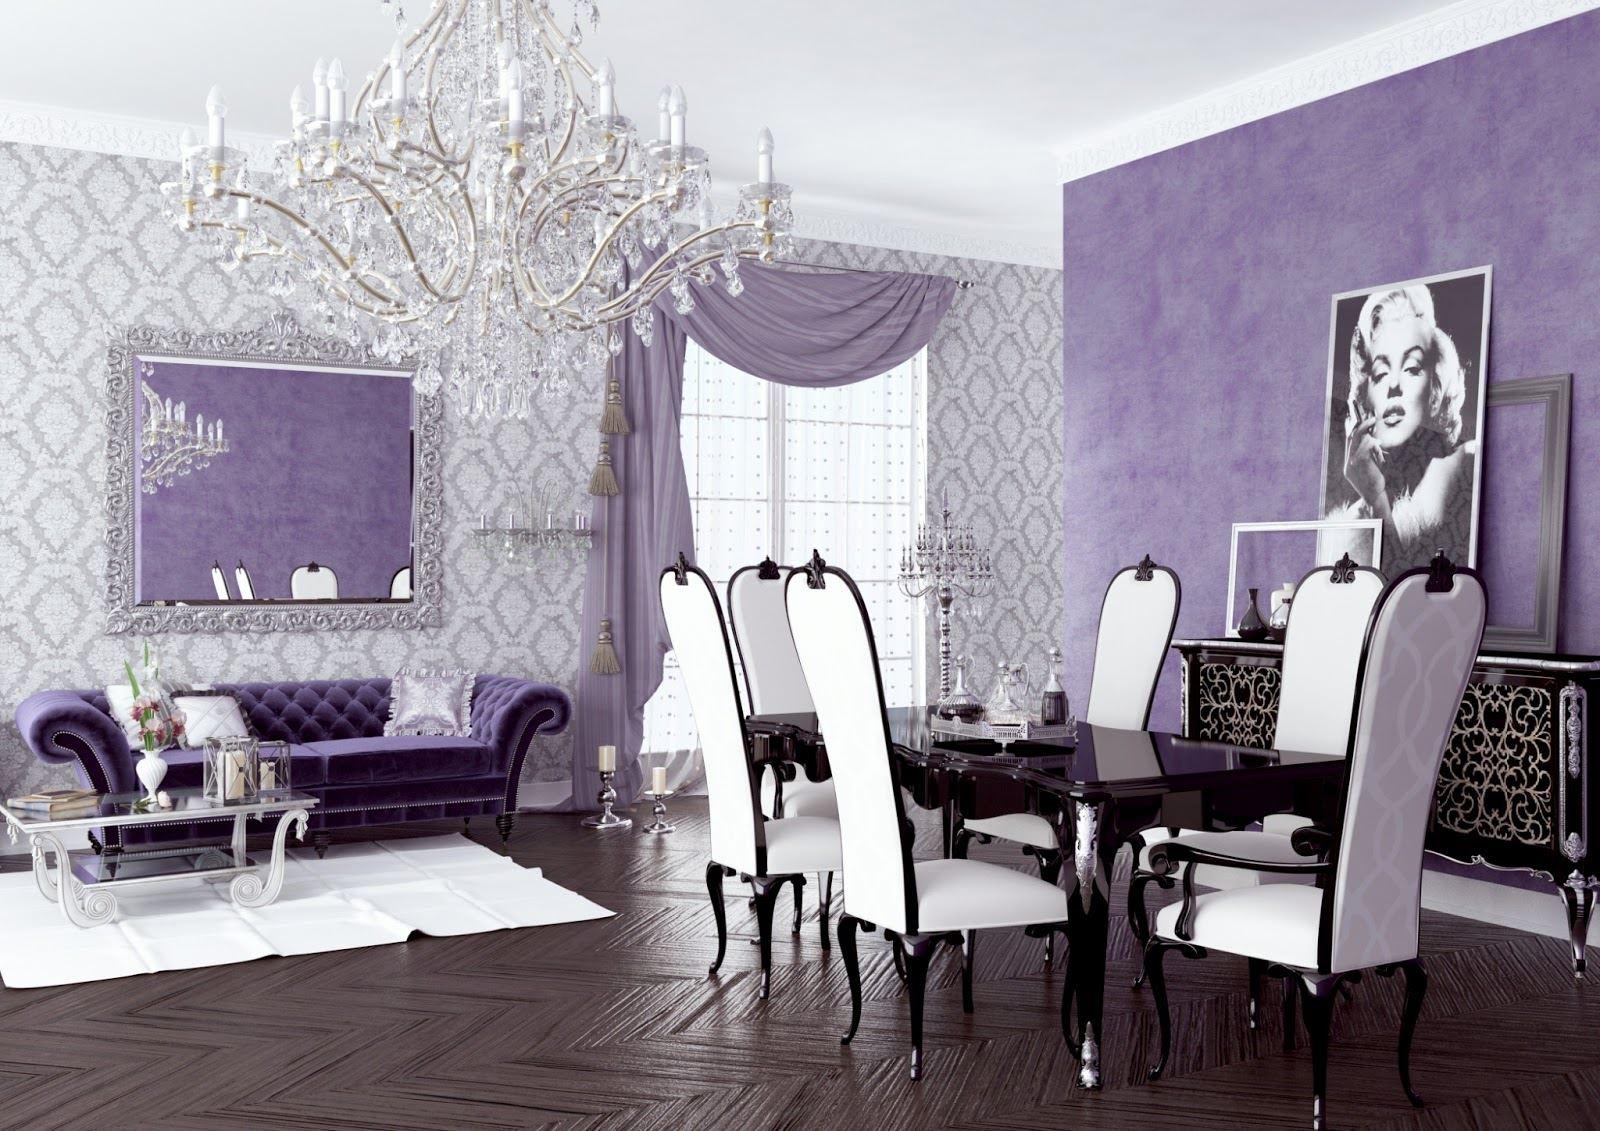 23 Purple Dining Room Designs Decorating Ideas: تاثیر روانی رنگ بنفش در دکوراسیون داخلی